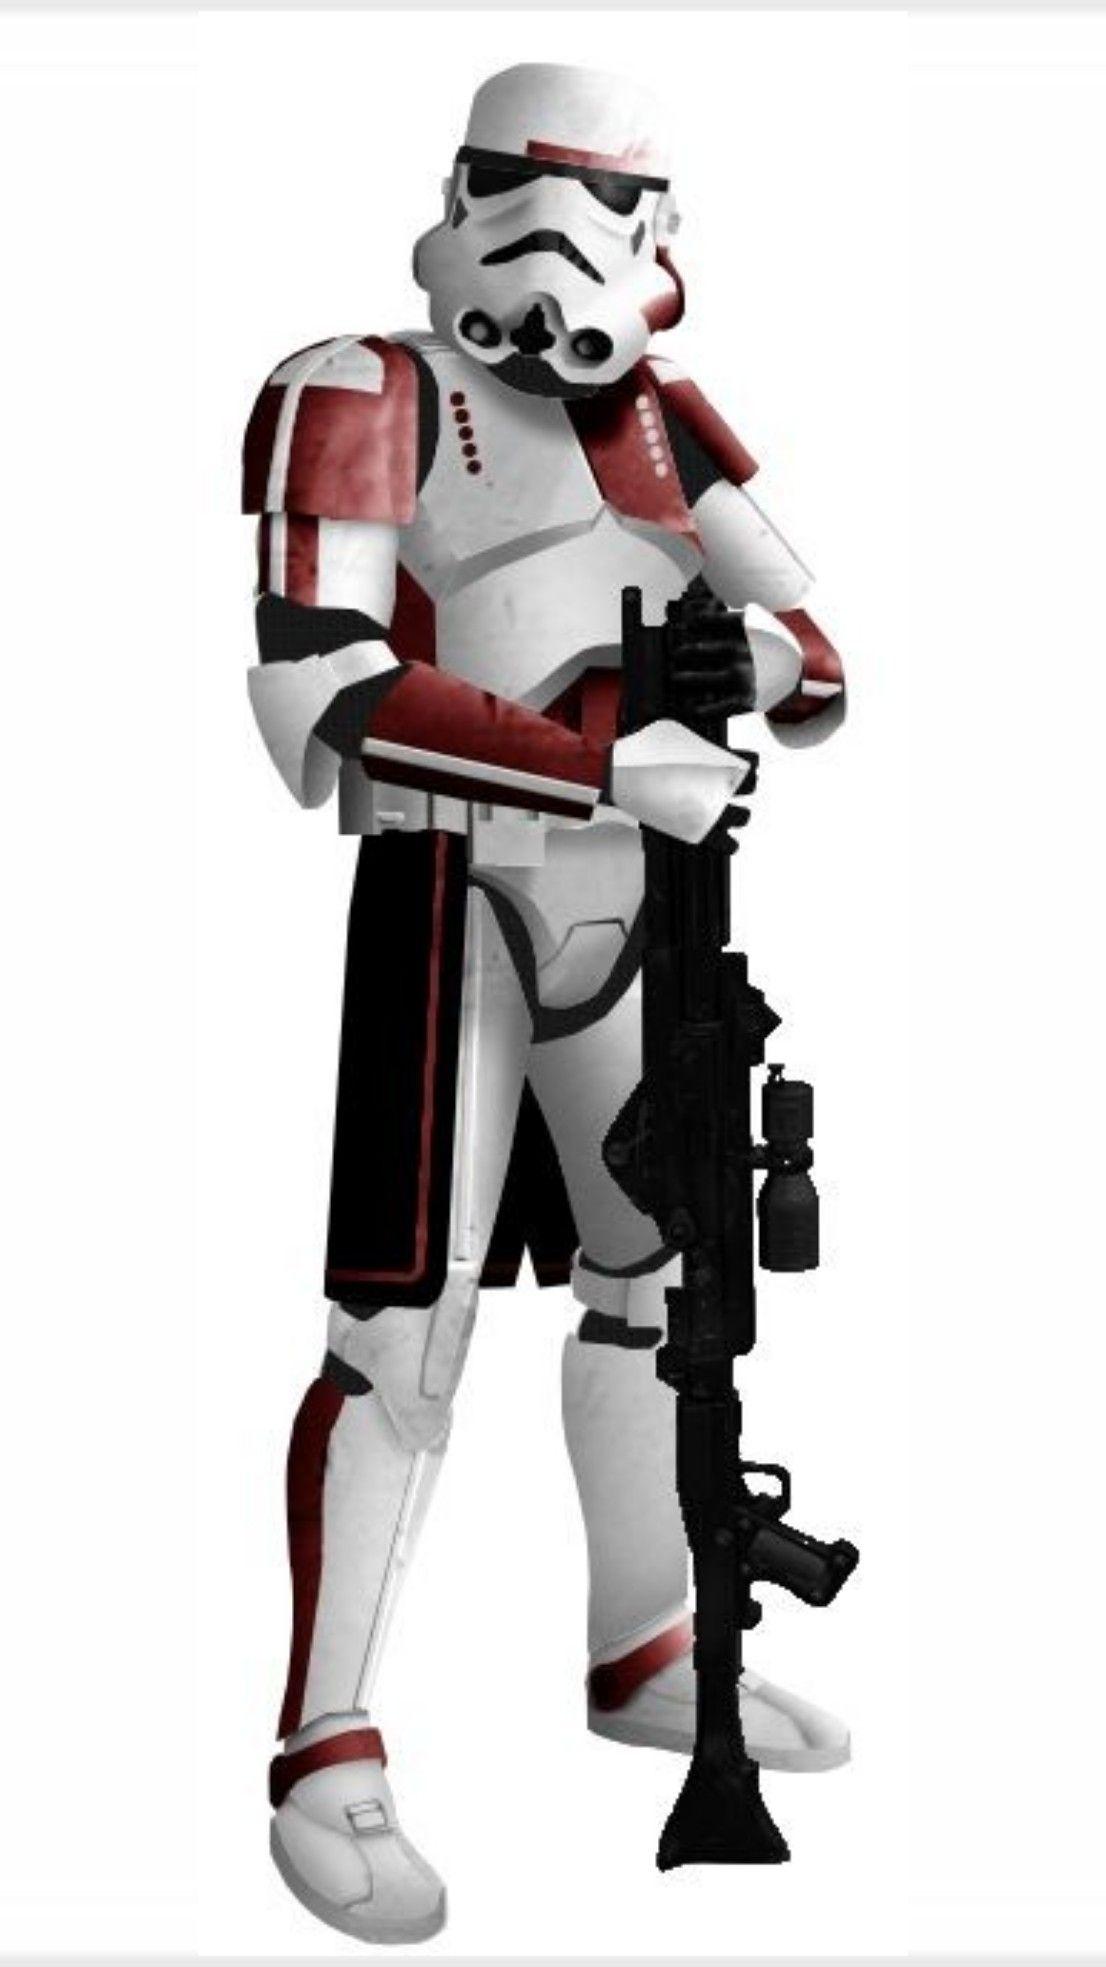 stormtrooper wars pictures wars characters